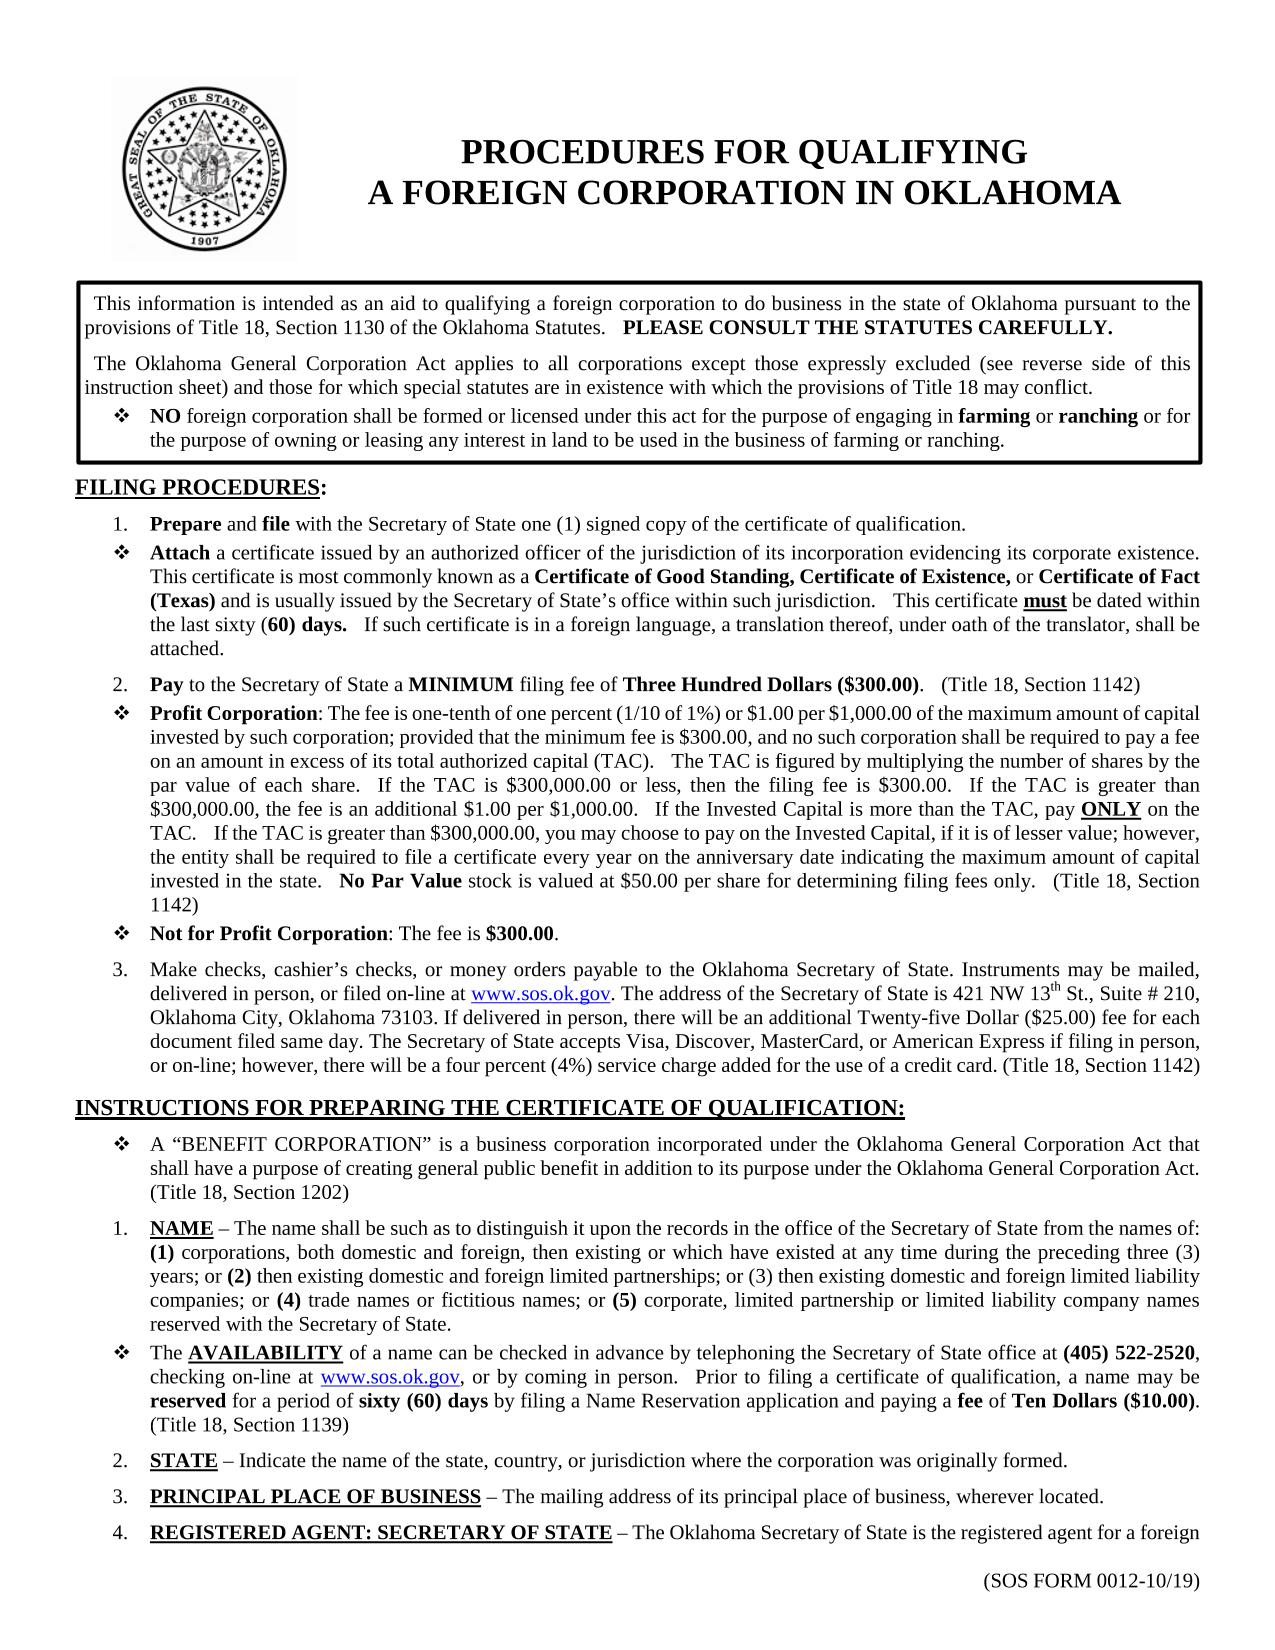 oklahoma-nonprofit-certificate-of-qualification